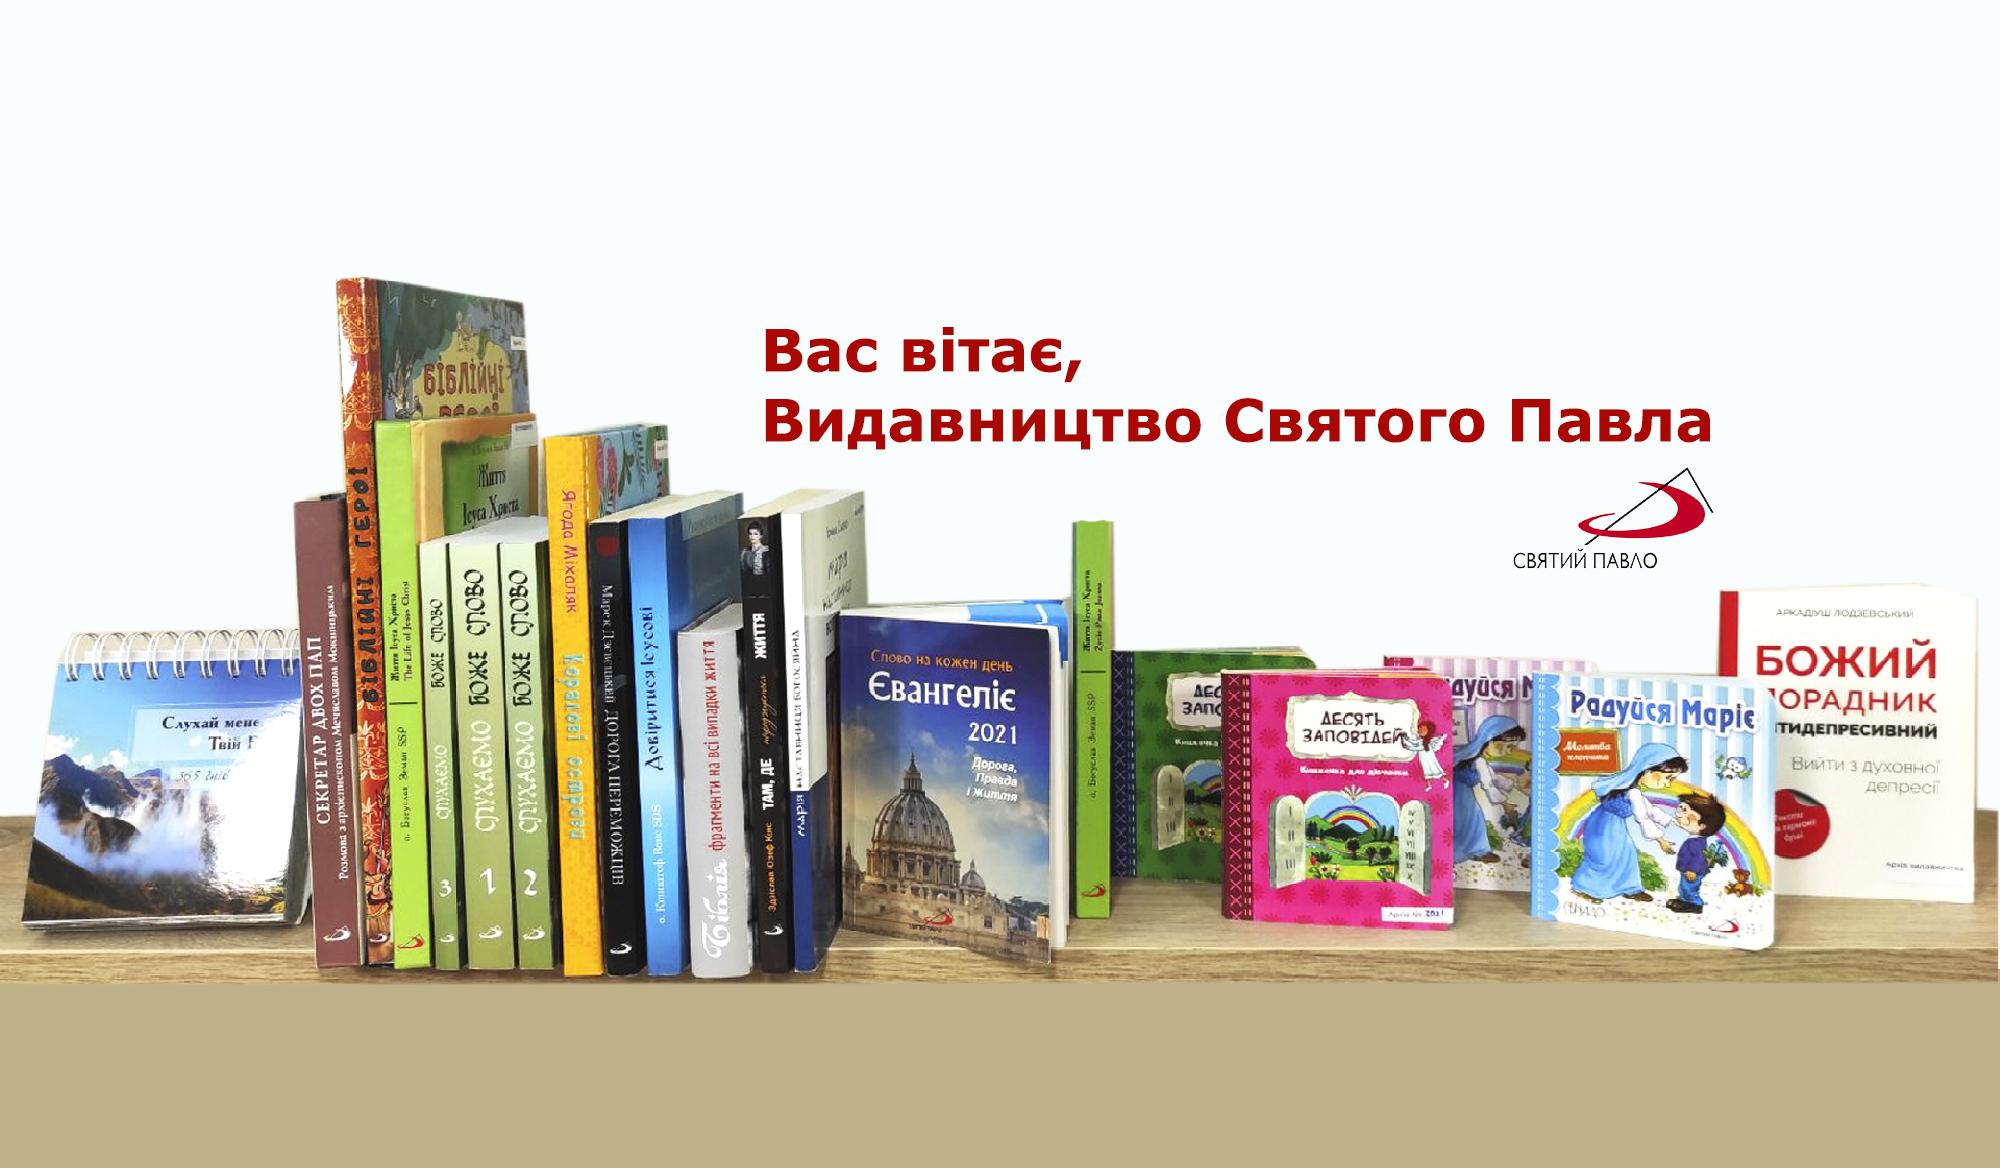 SviatyiPavlo.com